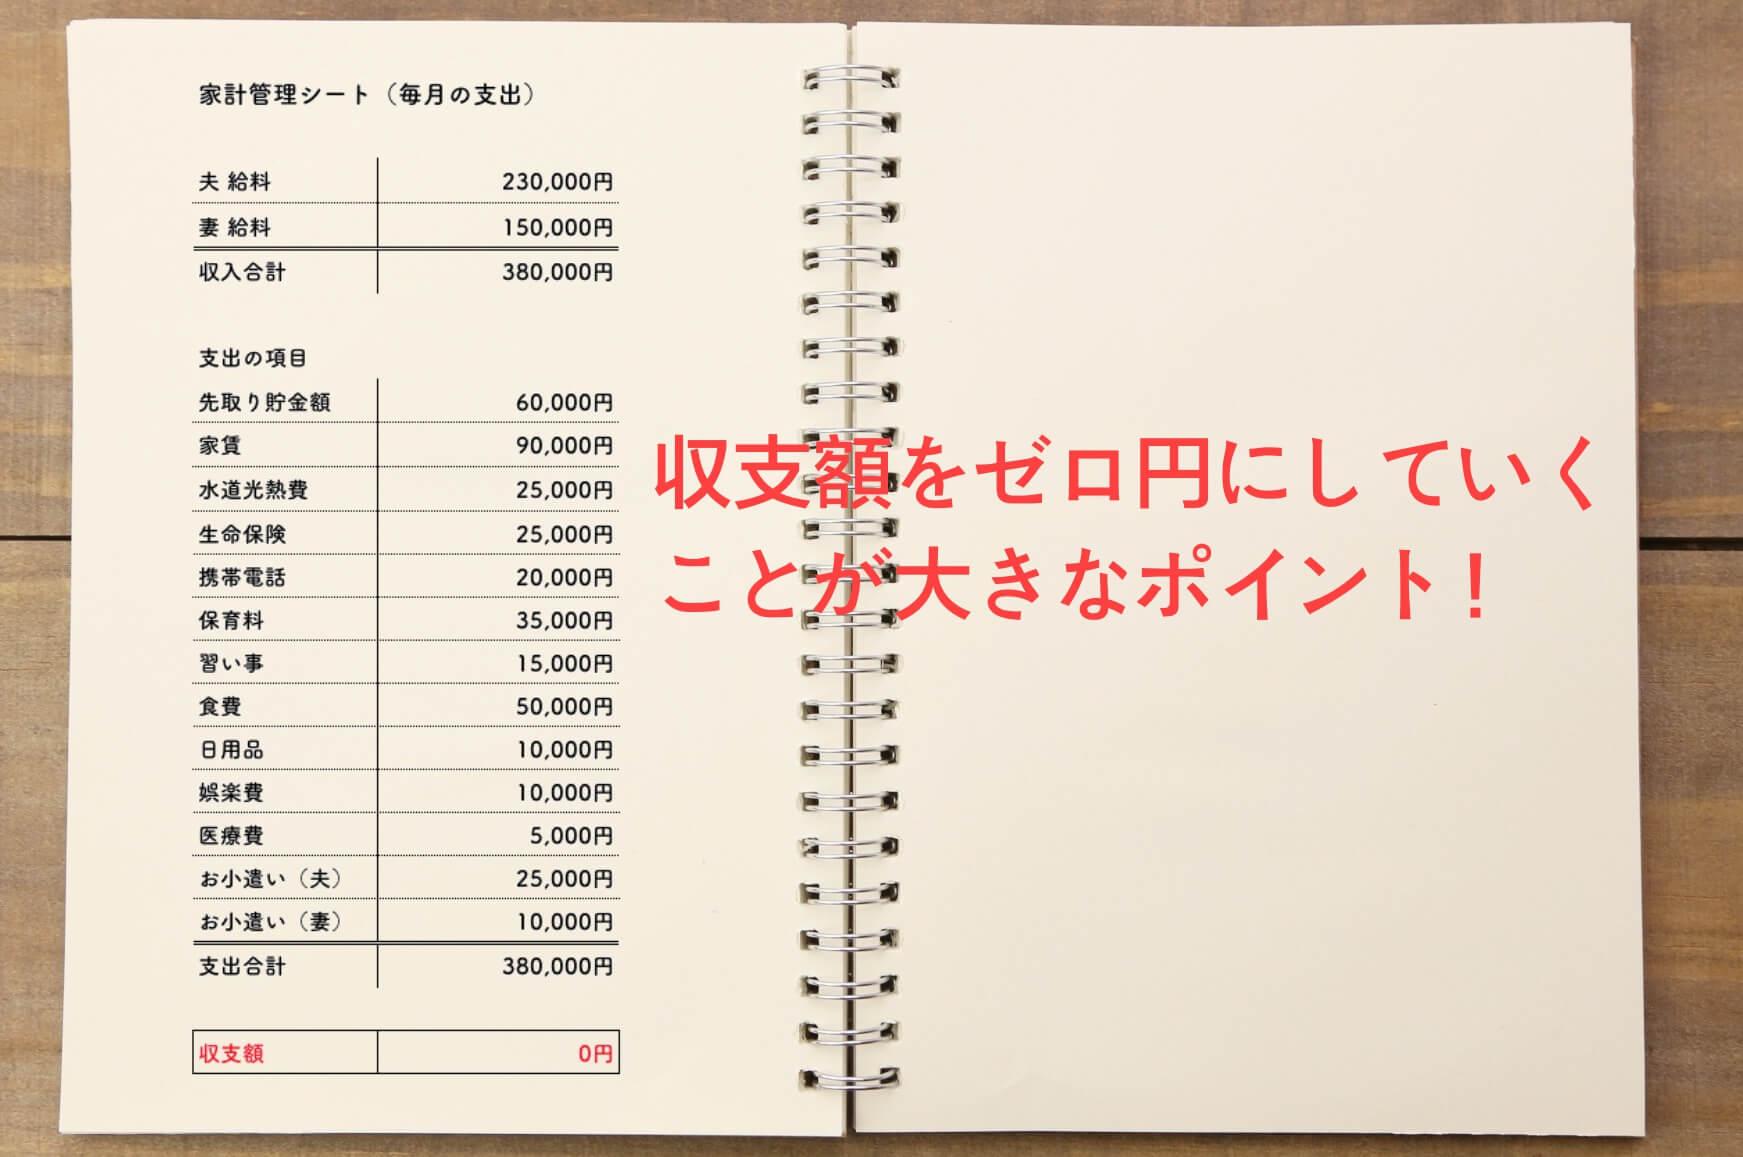 kakei_kakikata2_20180223